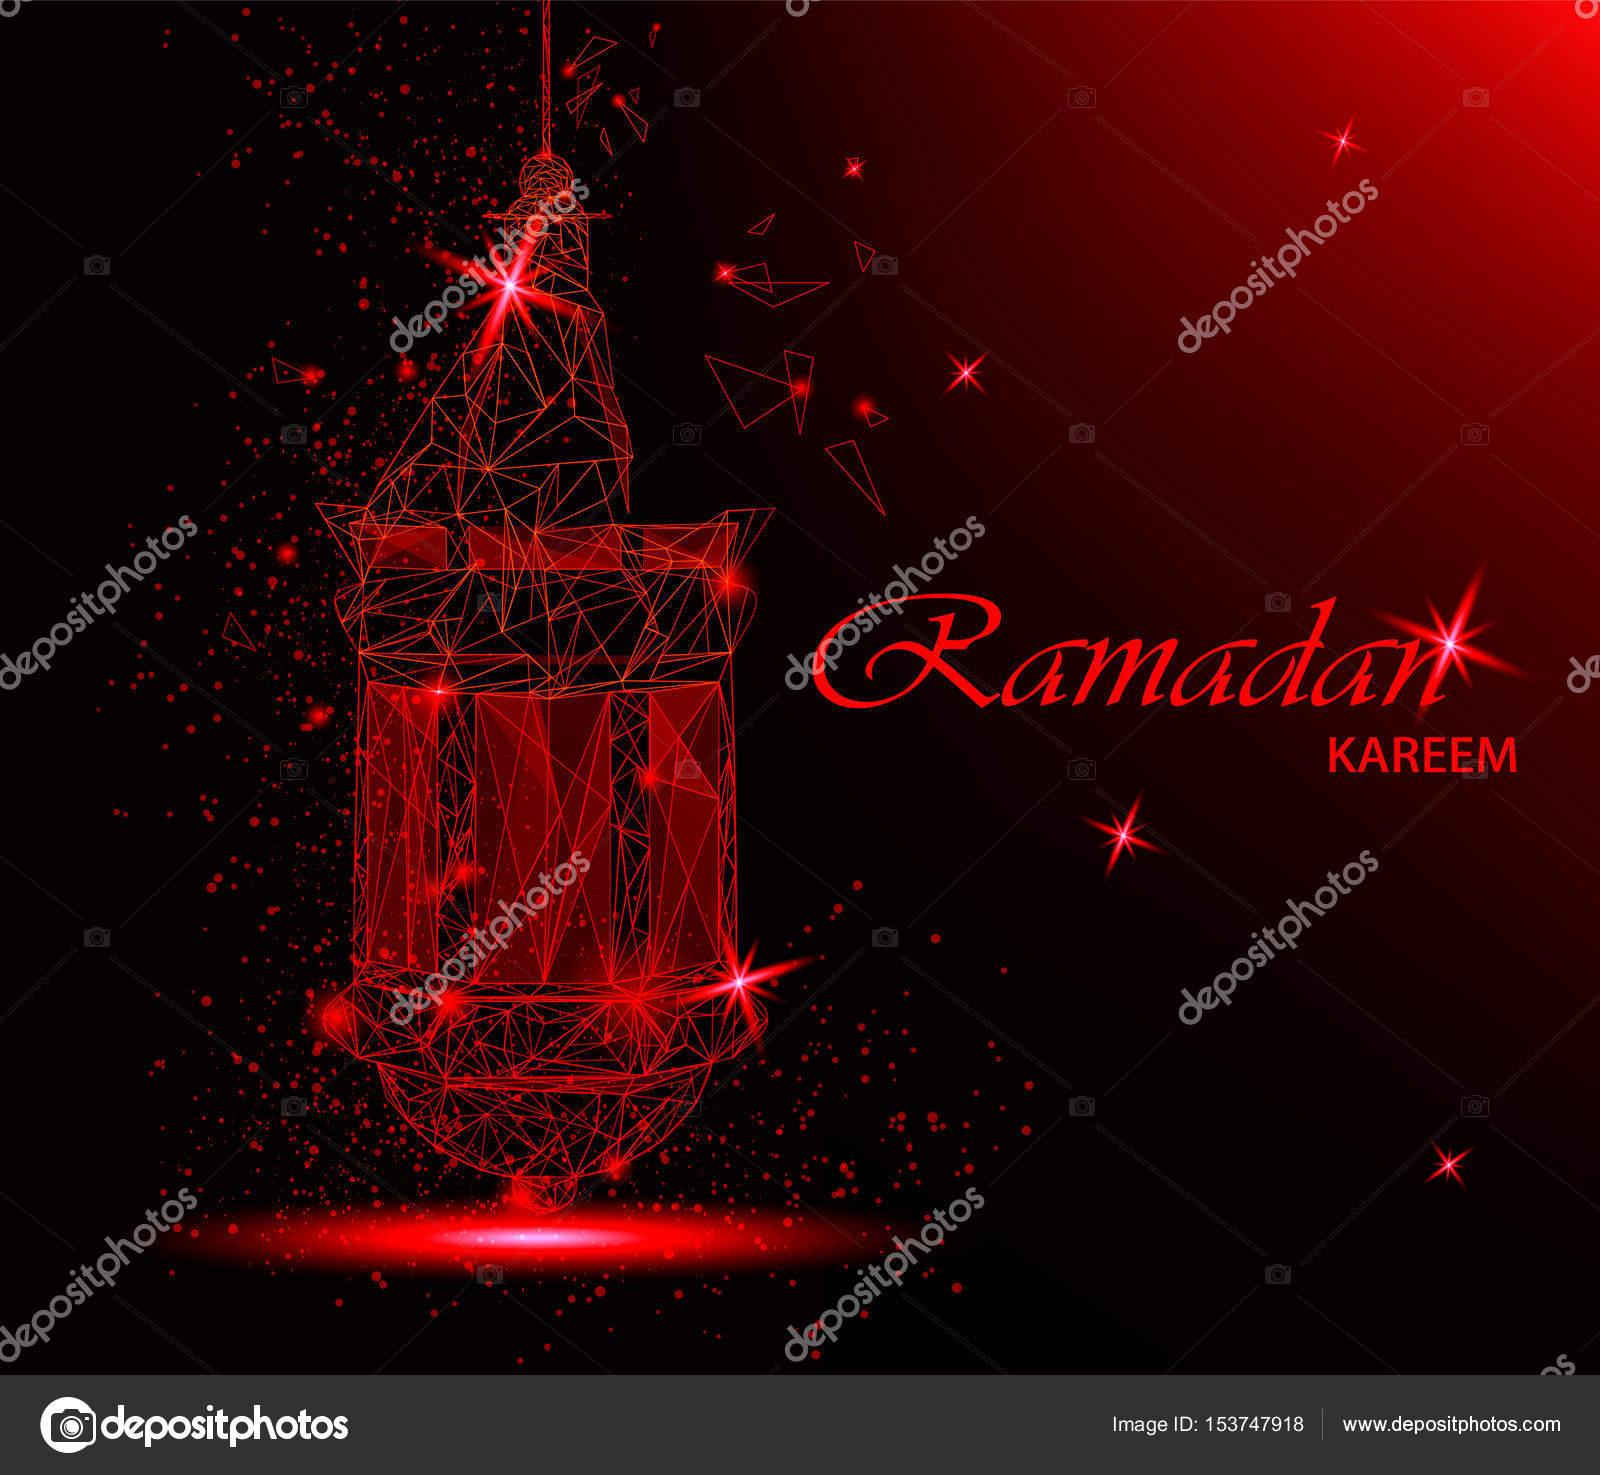 Ramadan Kareem Beautiful Greeting Card With Traditional Arabic Lantern.  Polygonal Art On Red Background.